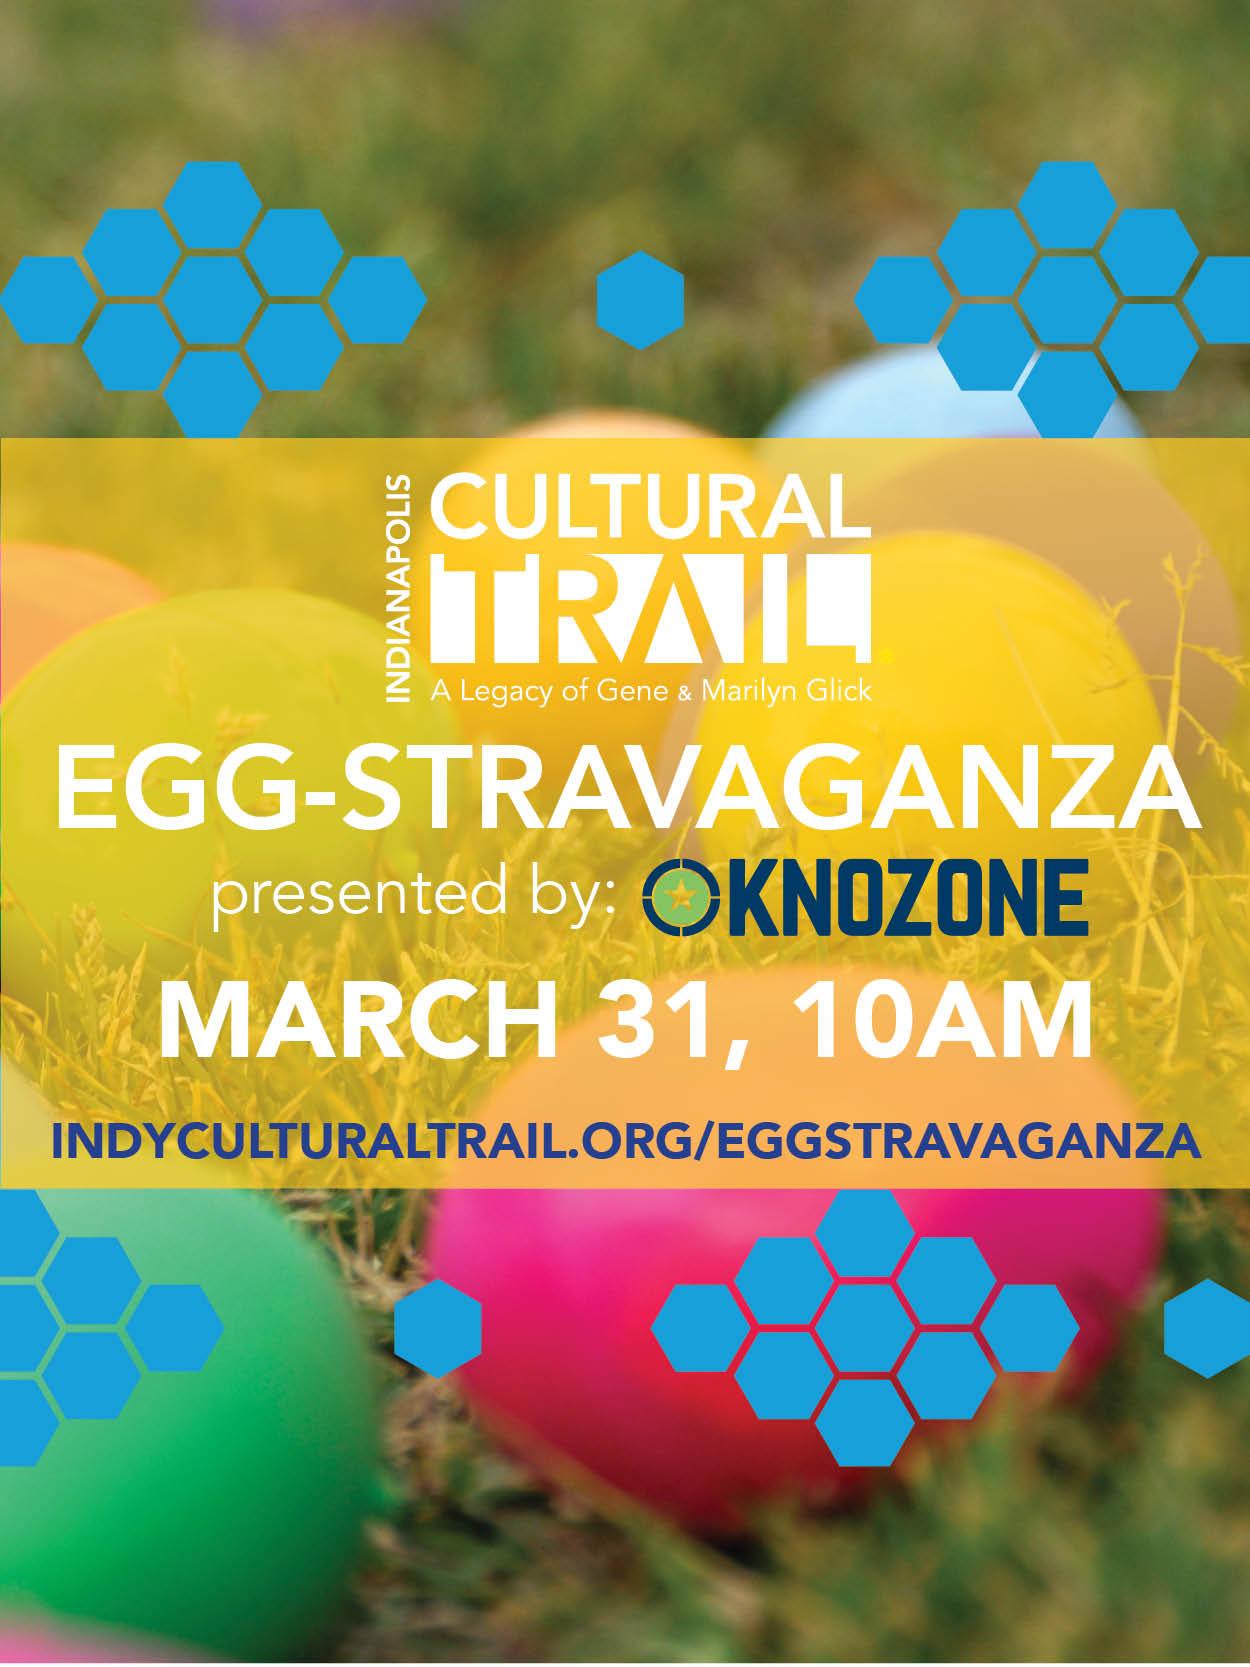 Cultural Trail Egg-Stravaganza 2018 Flyer